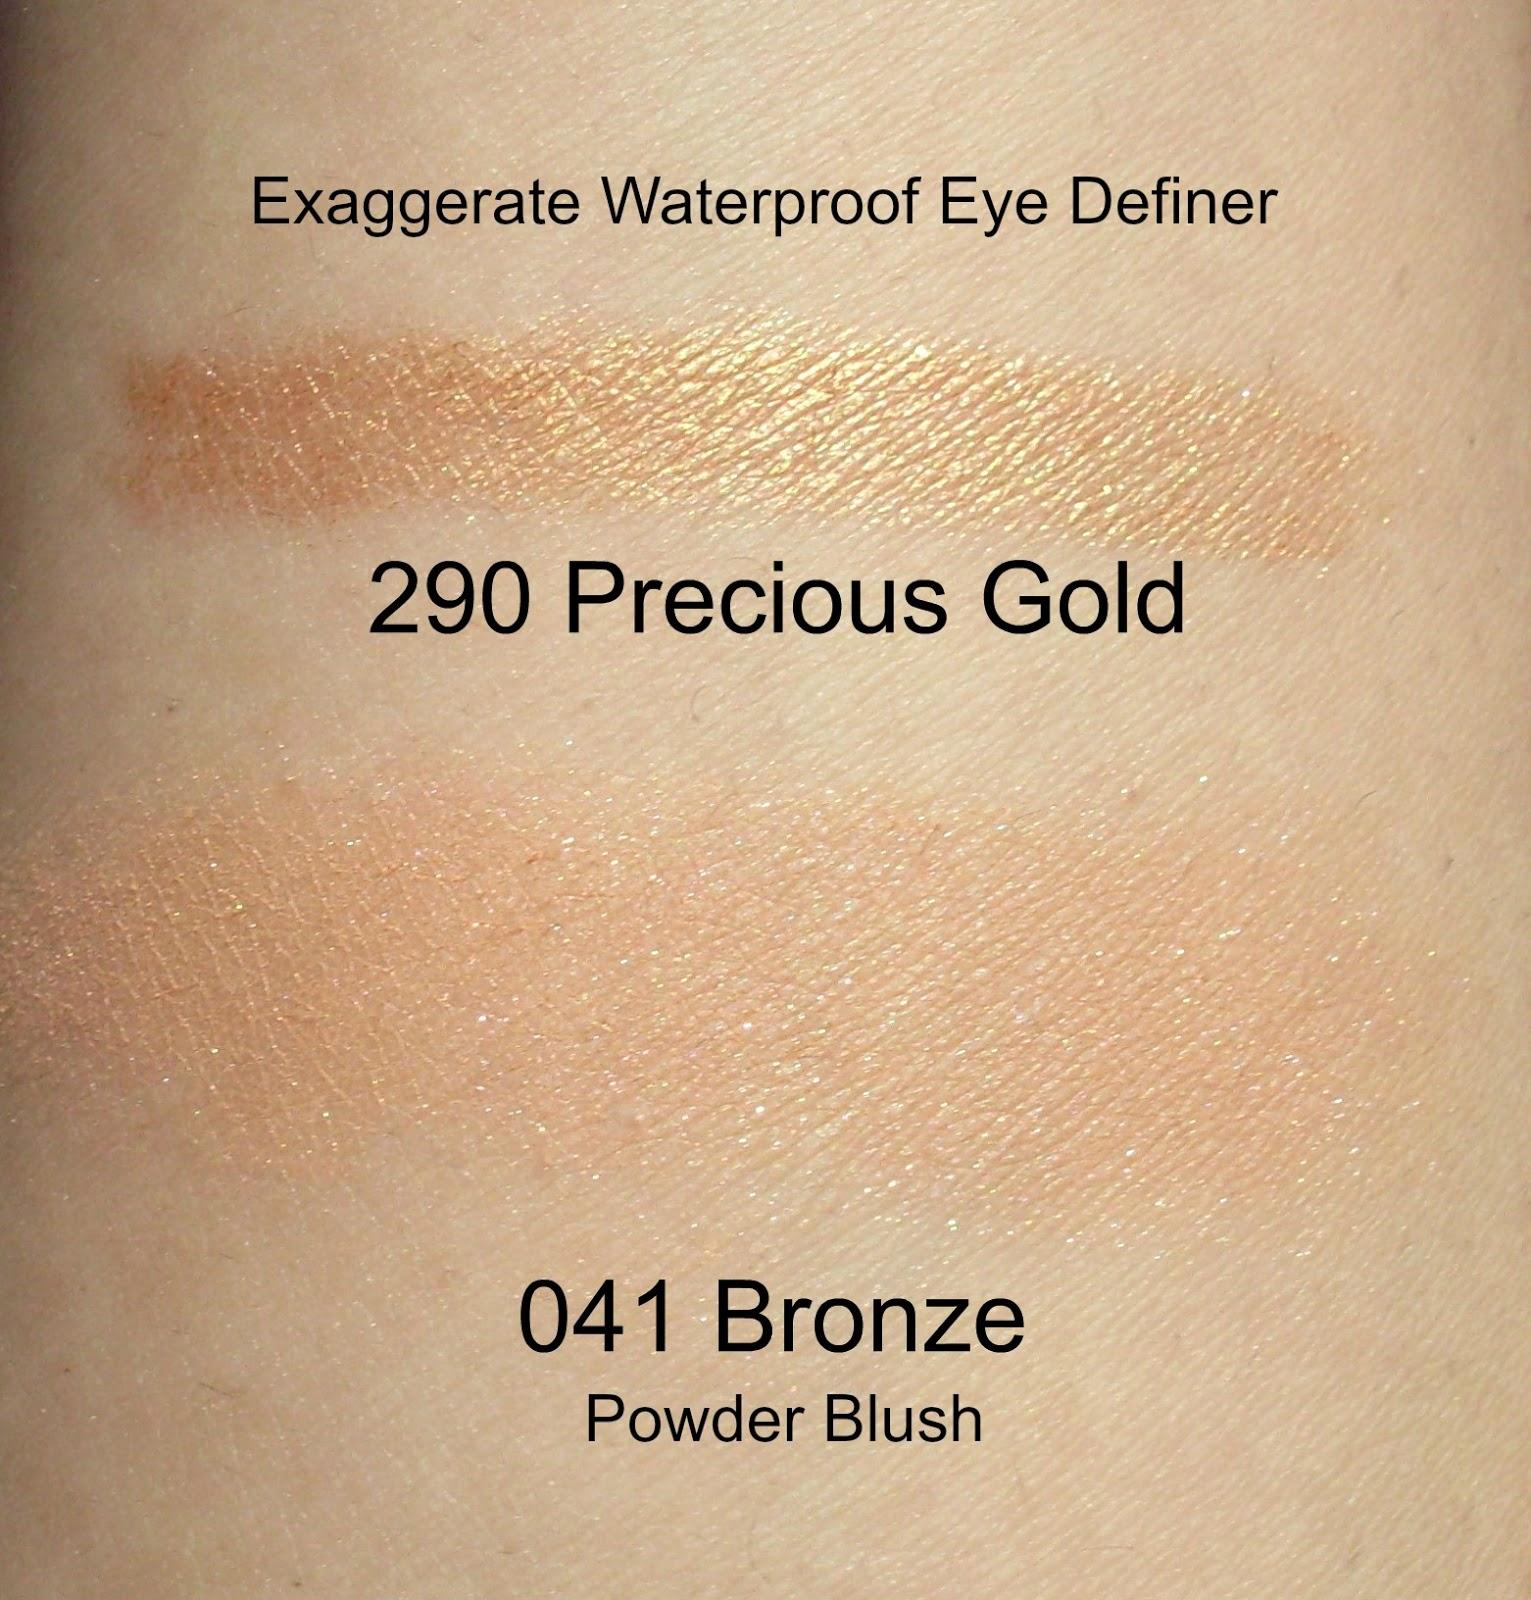 Rimmel Exxagerate eye definer swatch in precious gold and powder blush in 041 bronze